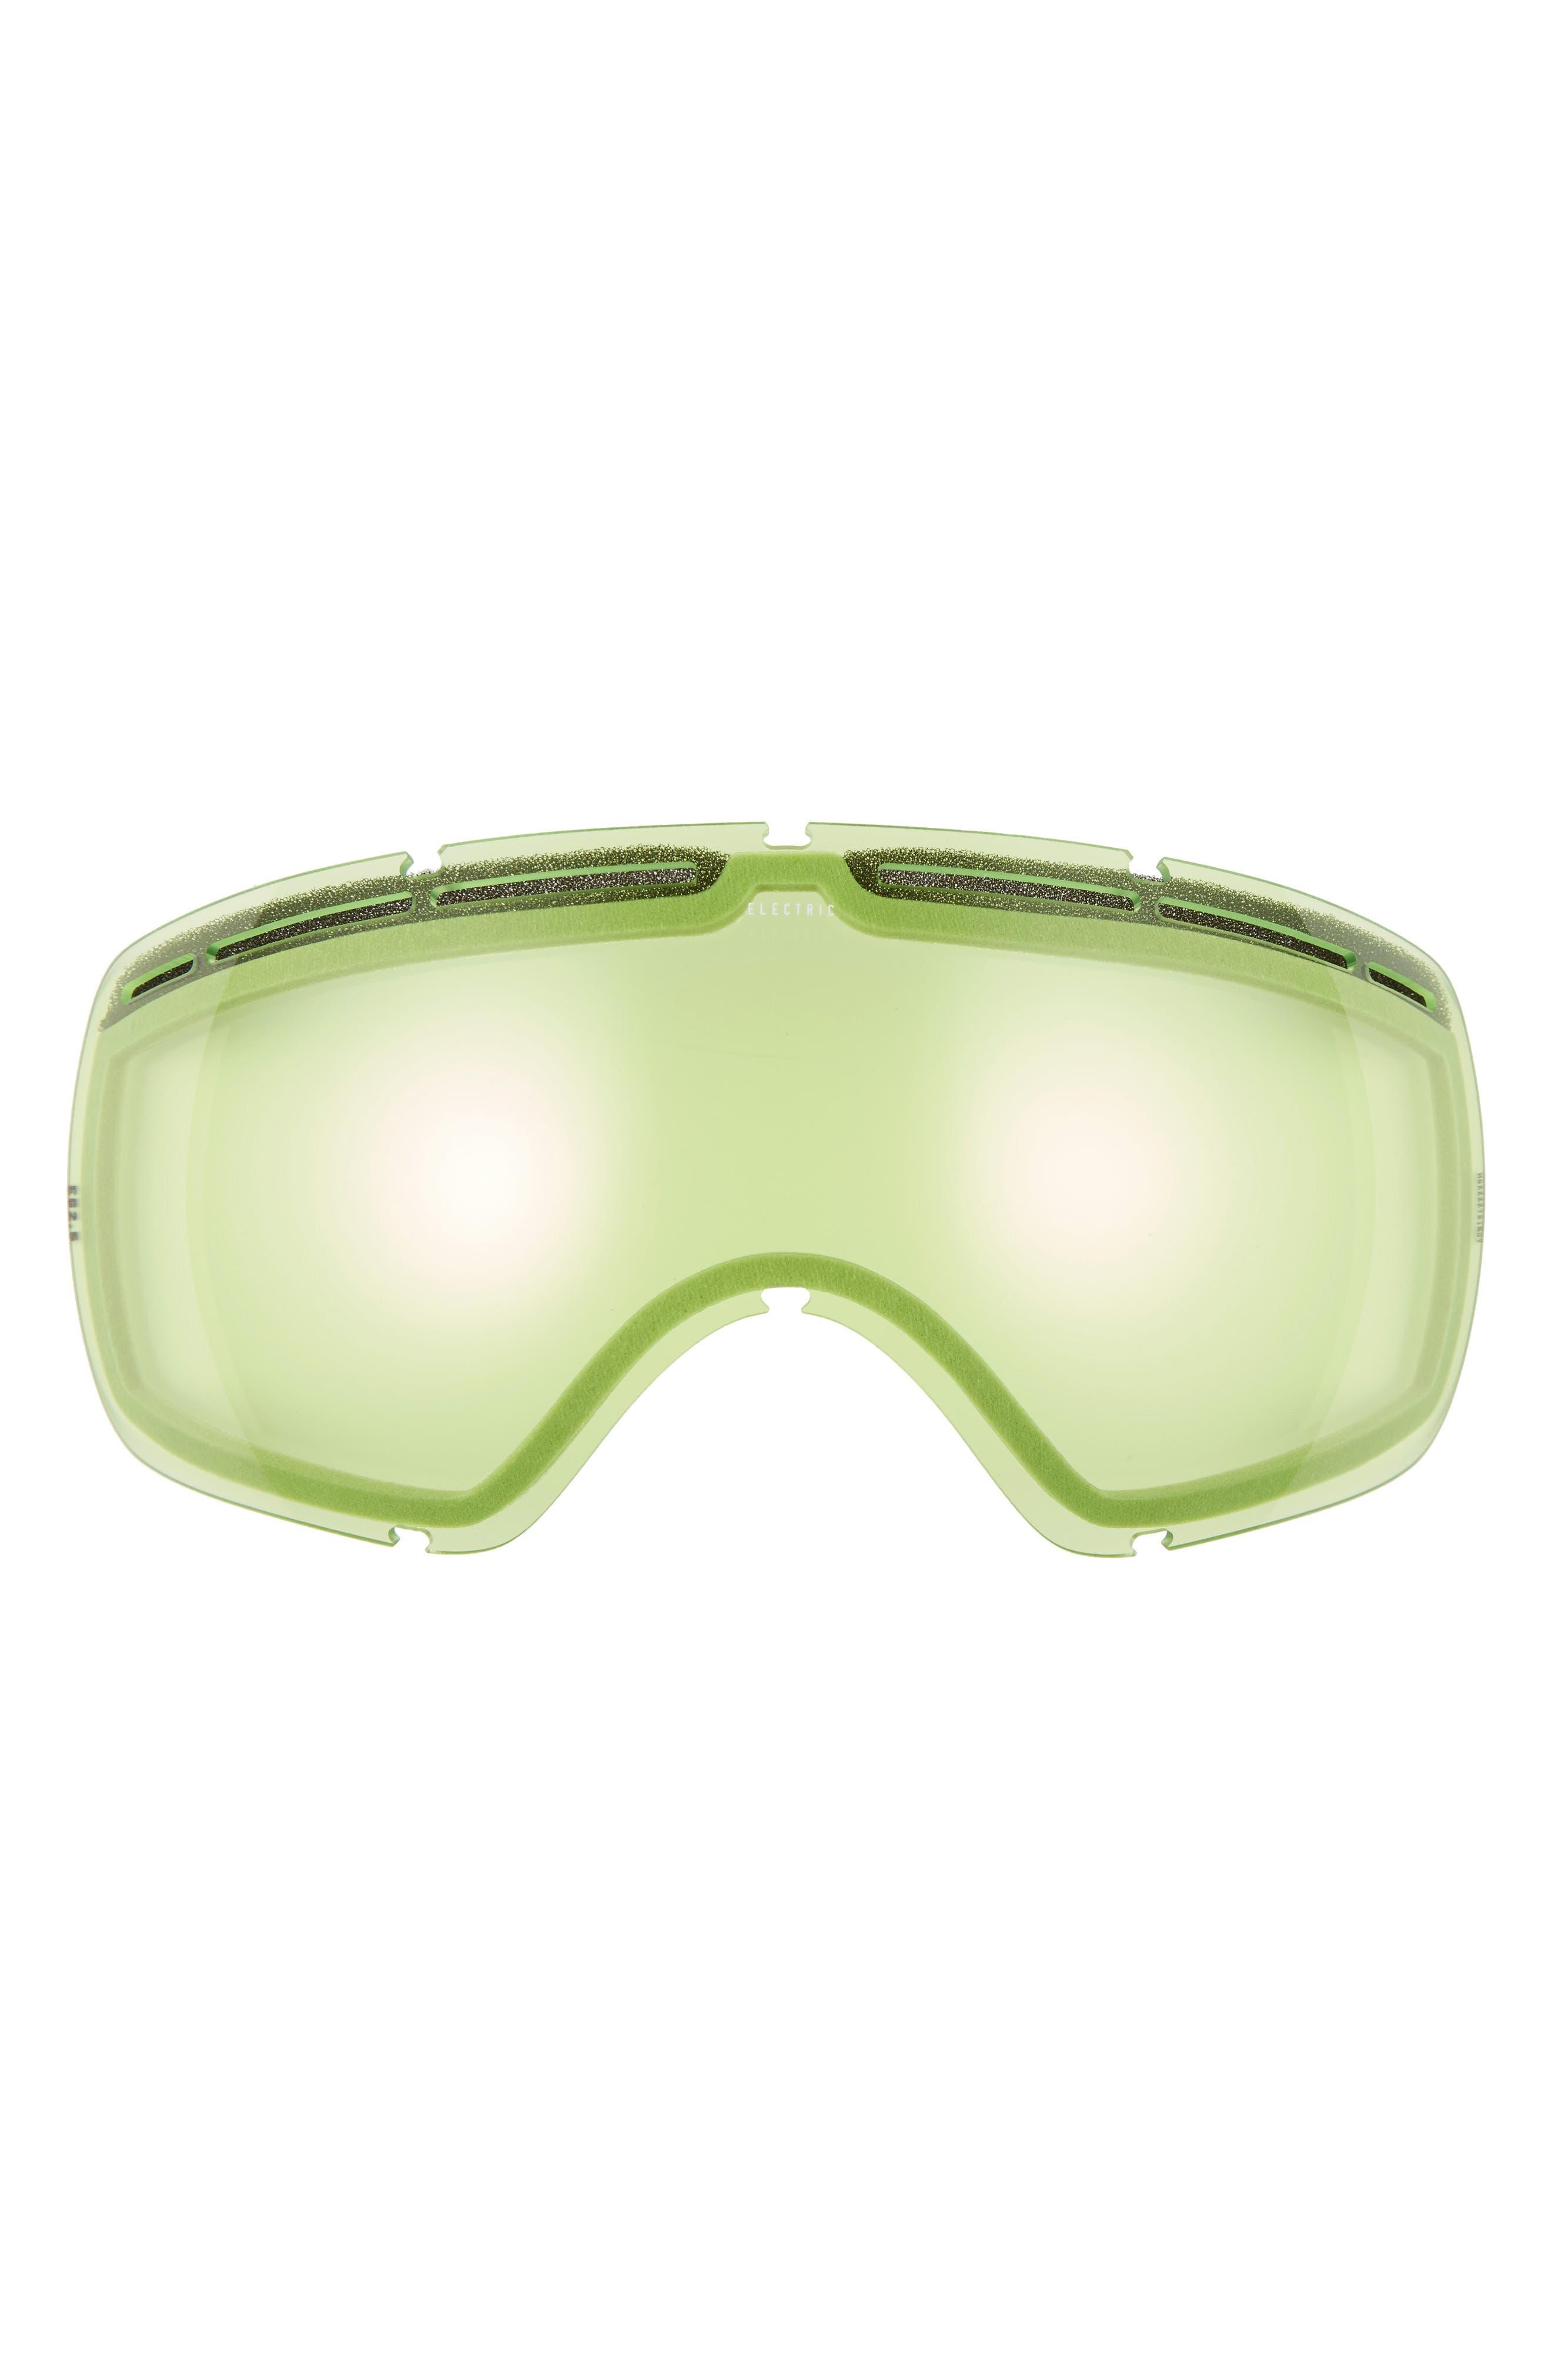 EG 2.5 215mm Snow Goggles,                             Alternate thumbnail 22, color,